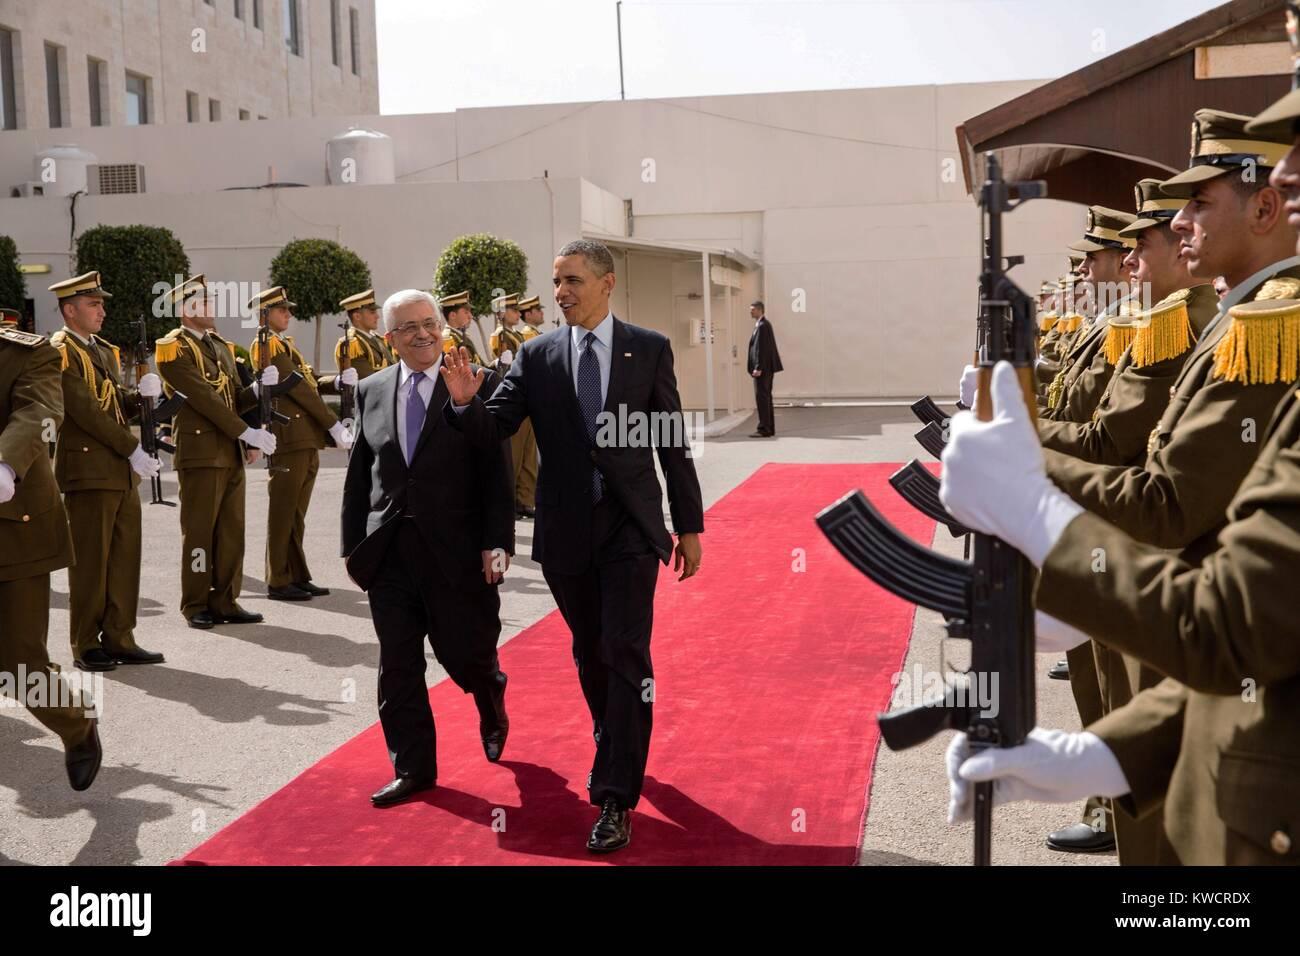 President Barack Obama walks with President Mahmoud Abbas of the Palestinian Authority. Ramallah, the West Bank, - Stock Image